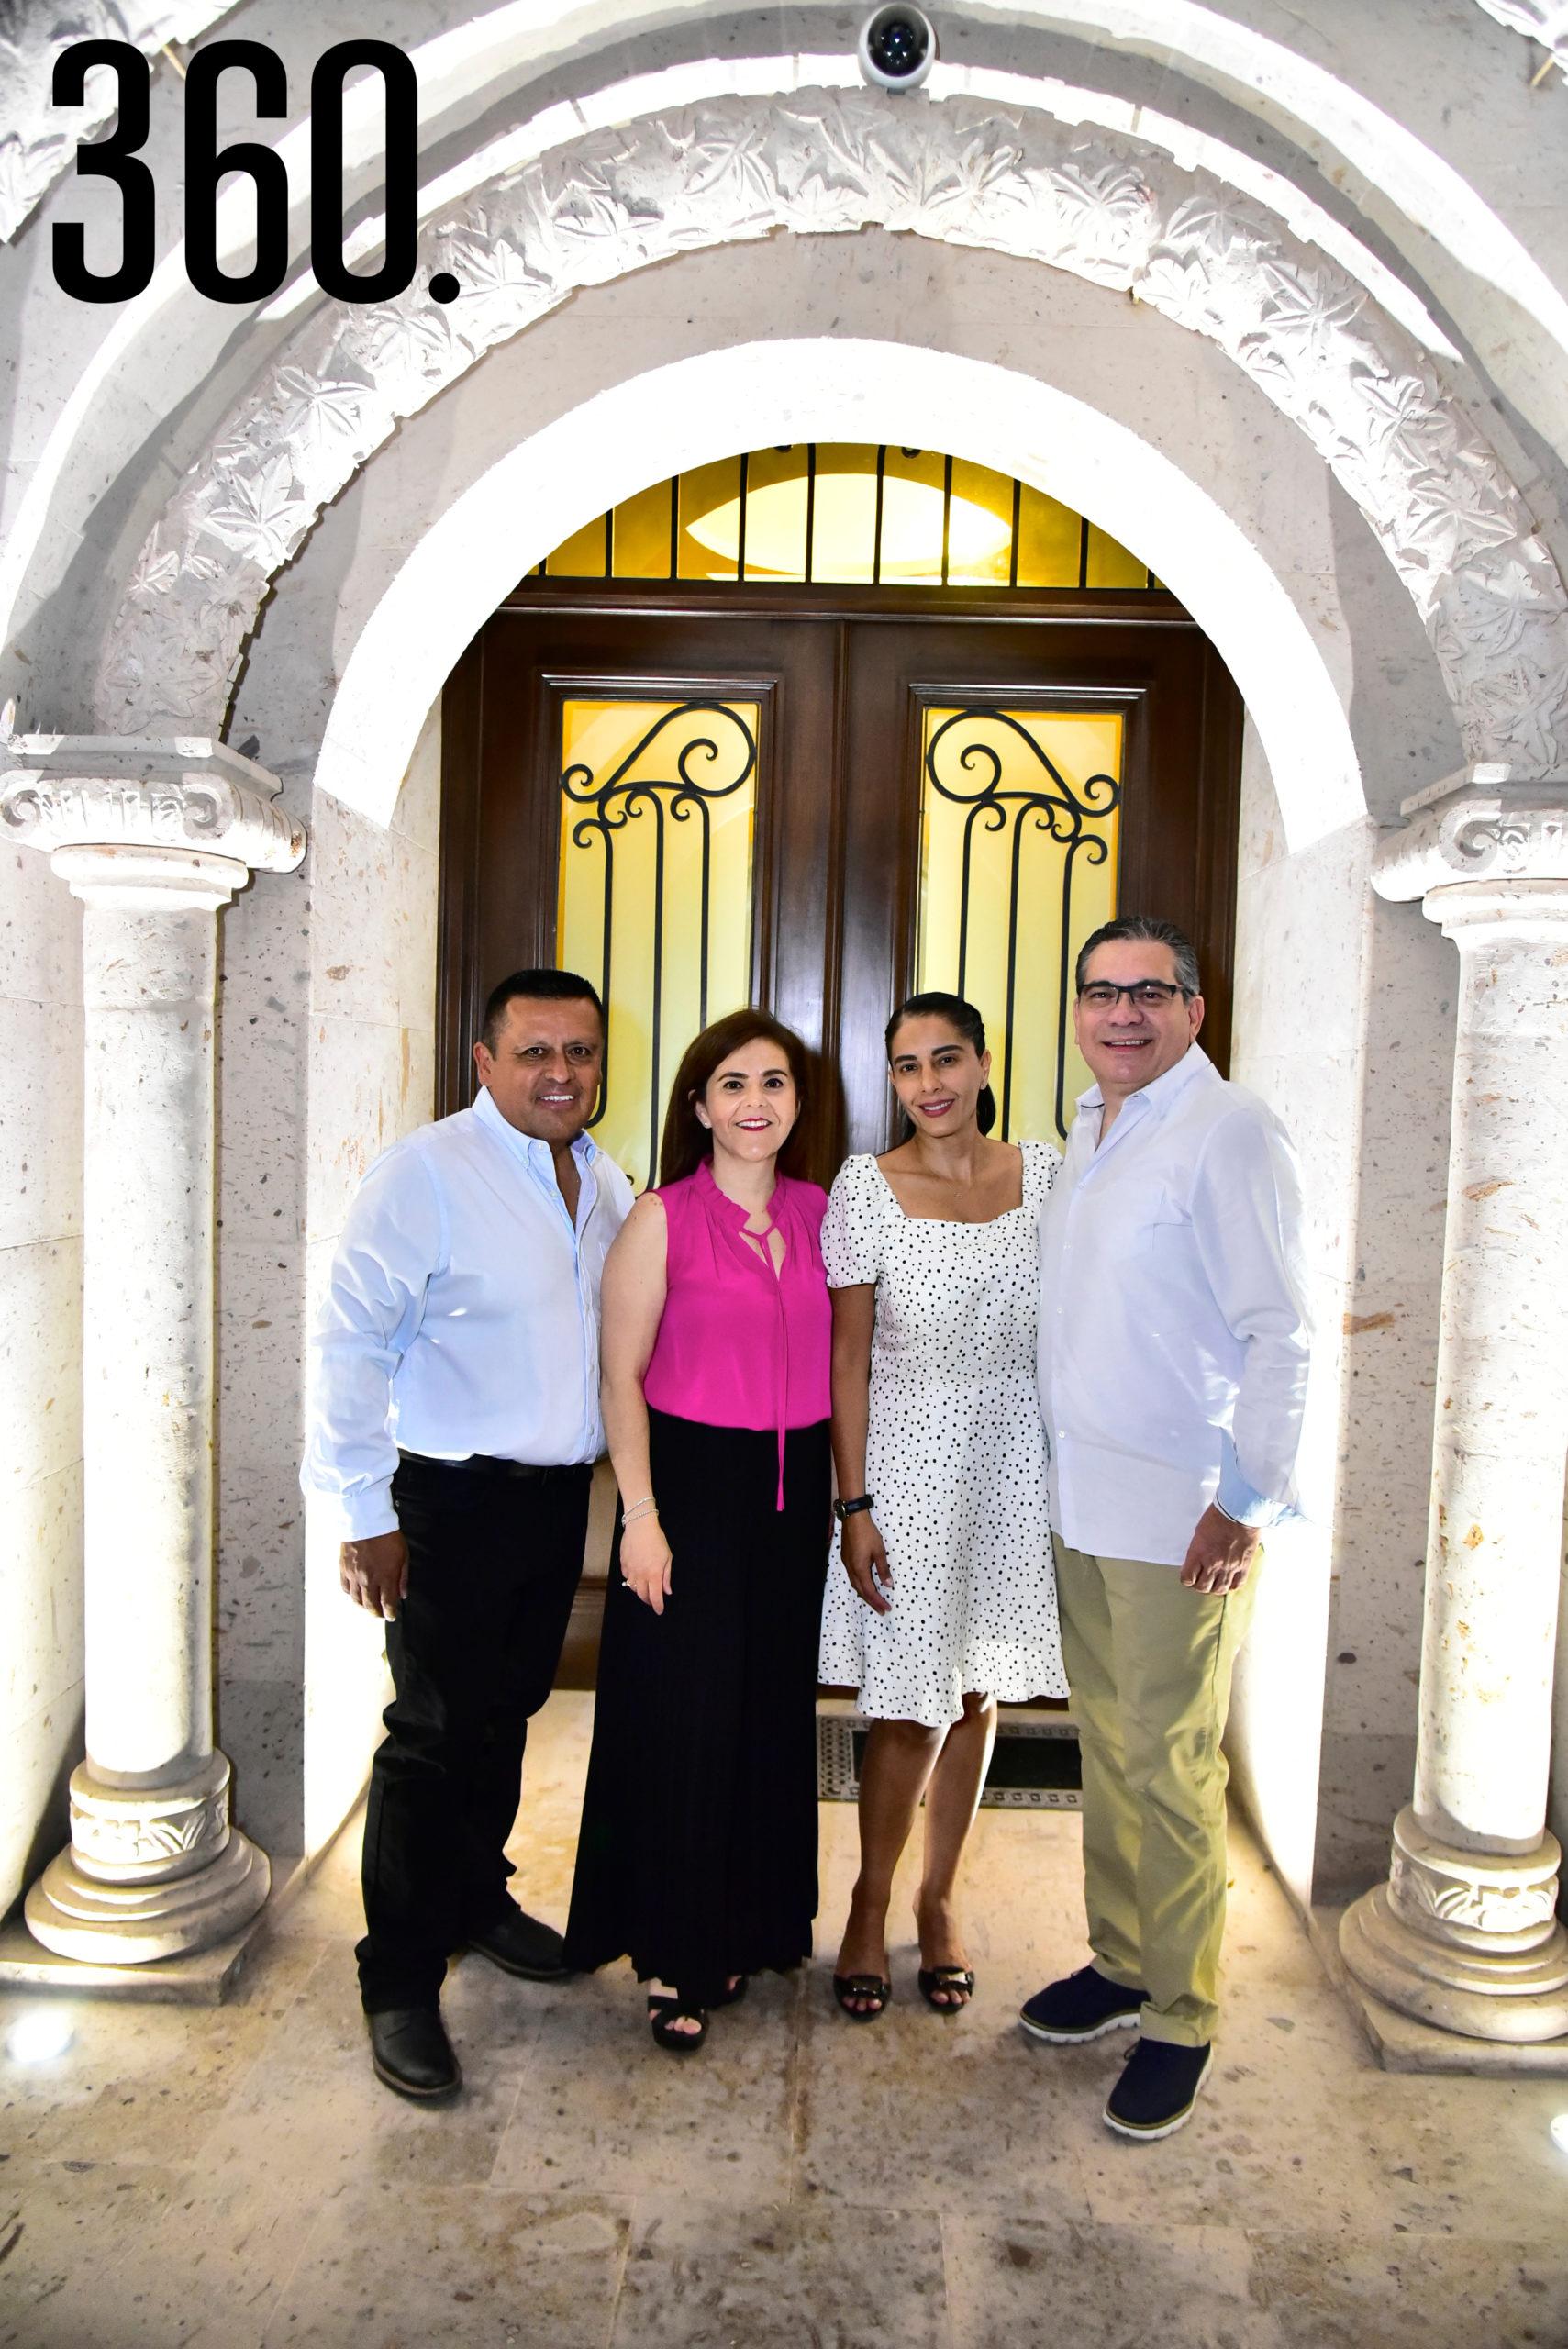 Alejandro Rodríguez, Yolanda Ramos, Erika Cadeñanes y Arnulfo Favila.